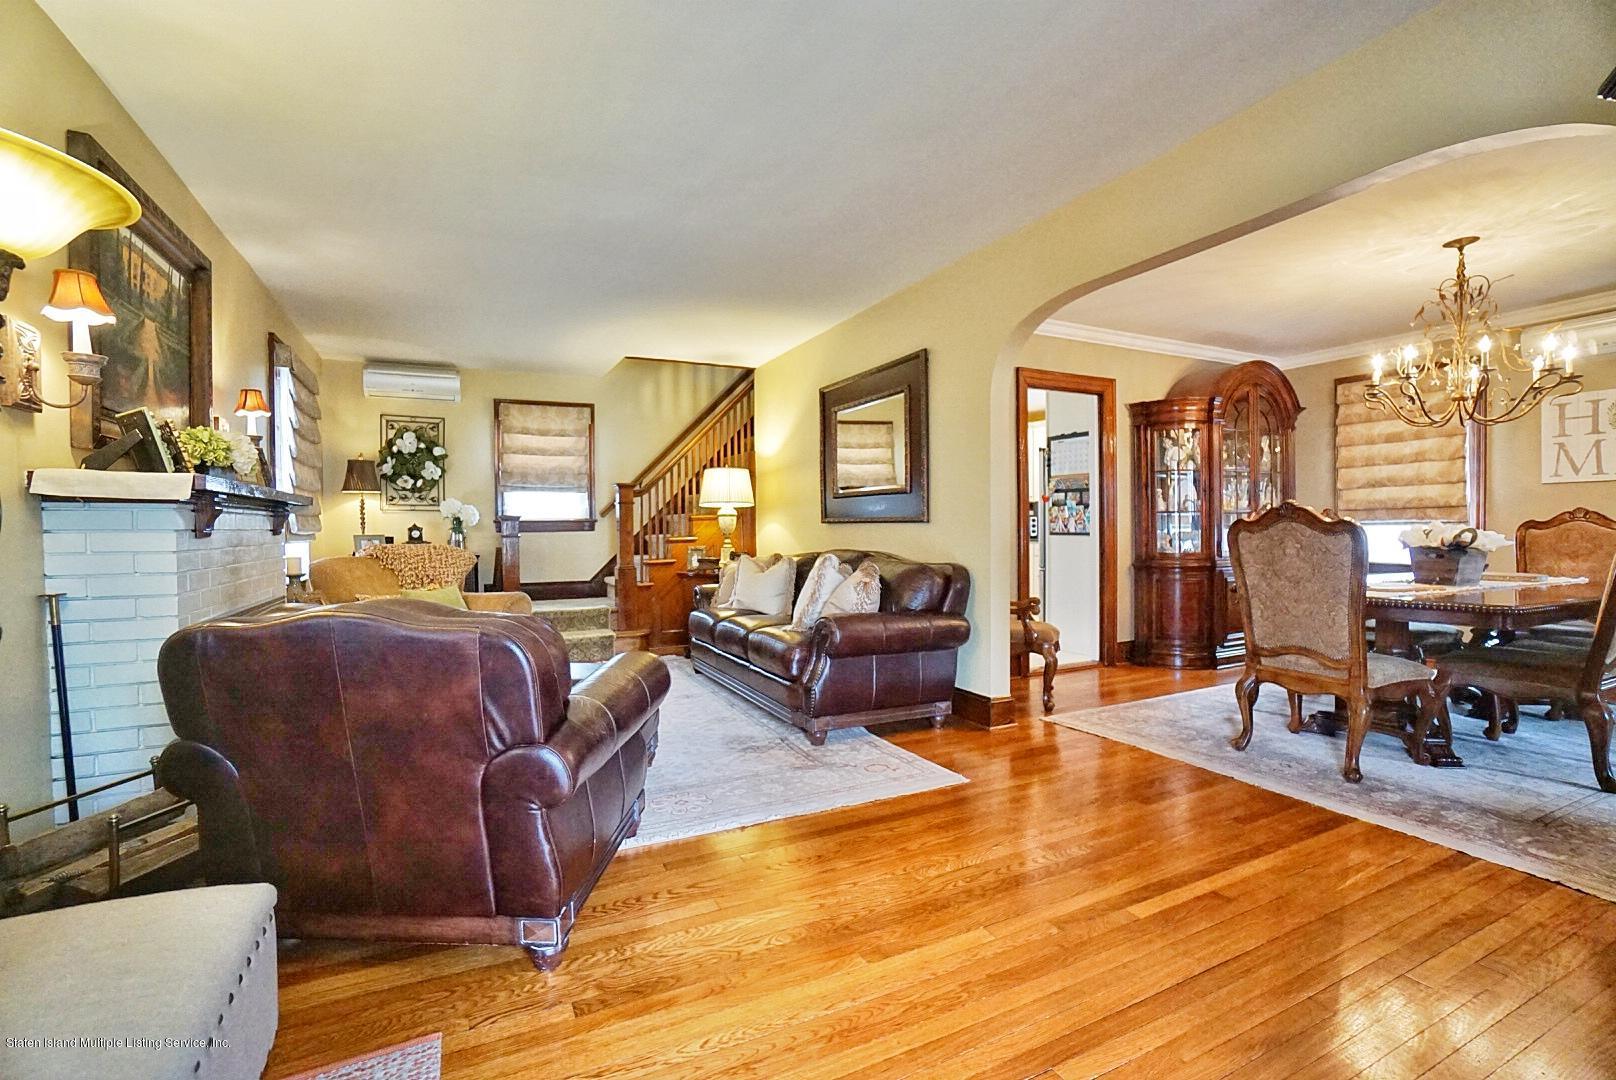 Single Family - Detached 171 Keiber Court  Staten Island, NY 10314, MLS-1127425-9